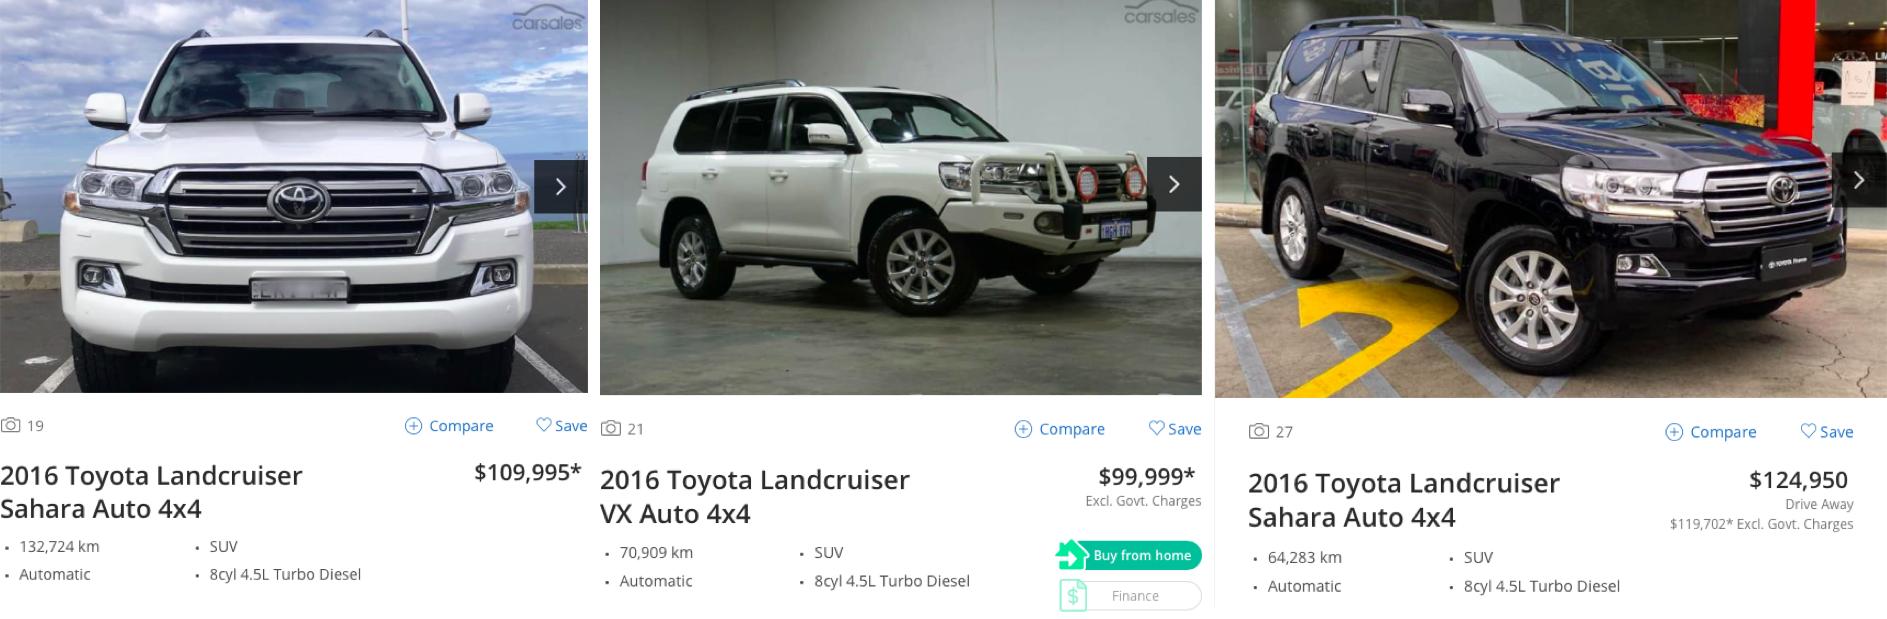 landcruiser - second hand market